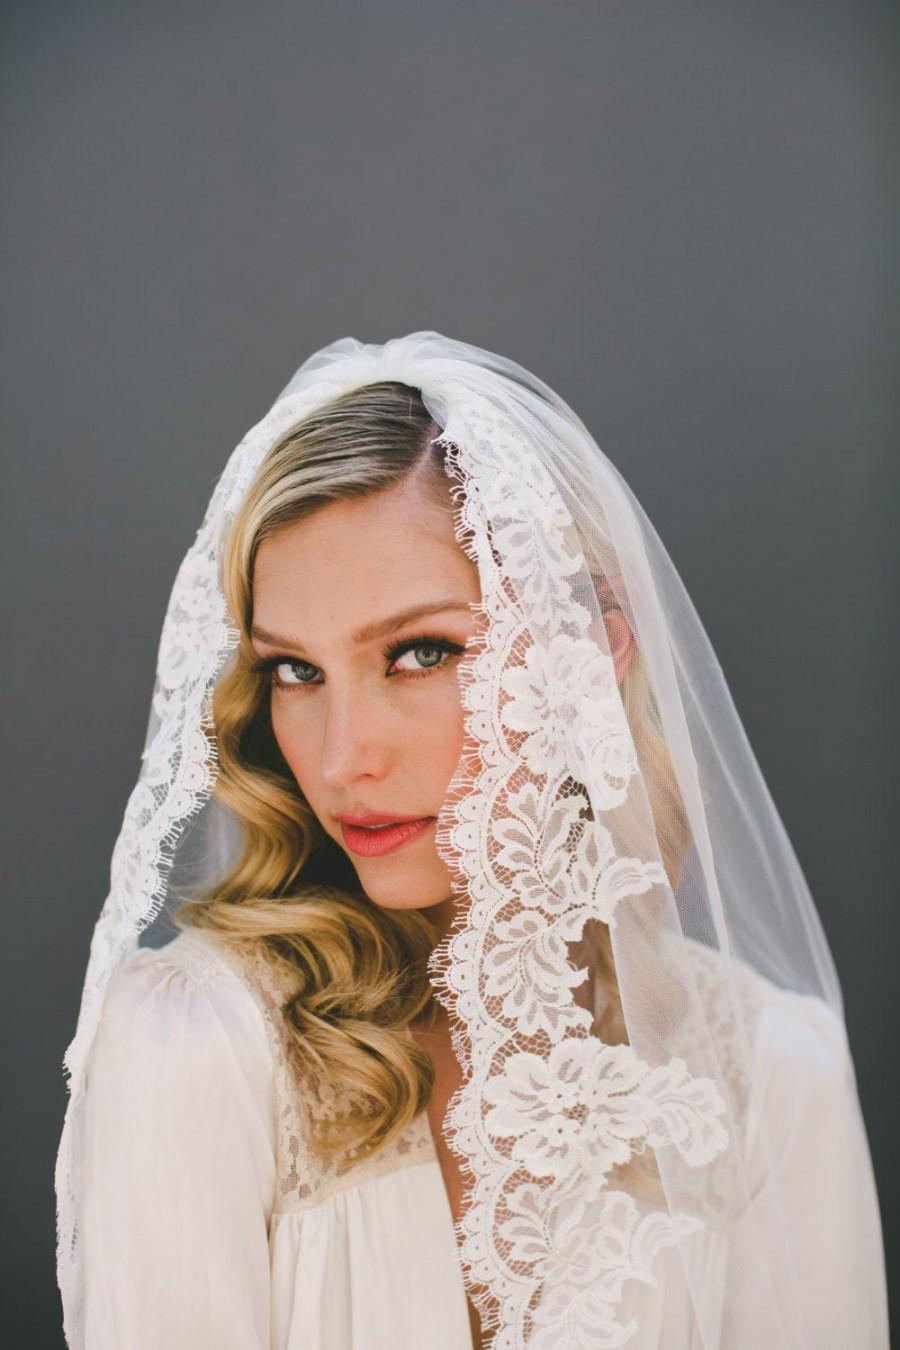 Свадьба - Mantilla Veil-Ivory Lace Veil-Eyelash fringe Lace-Chapel Veil-Simple Wedding Veil-Soft Wedding Veil-First Communion Veil-Church Veil-  1573